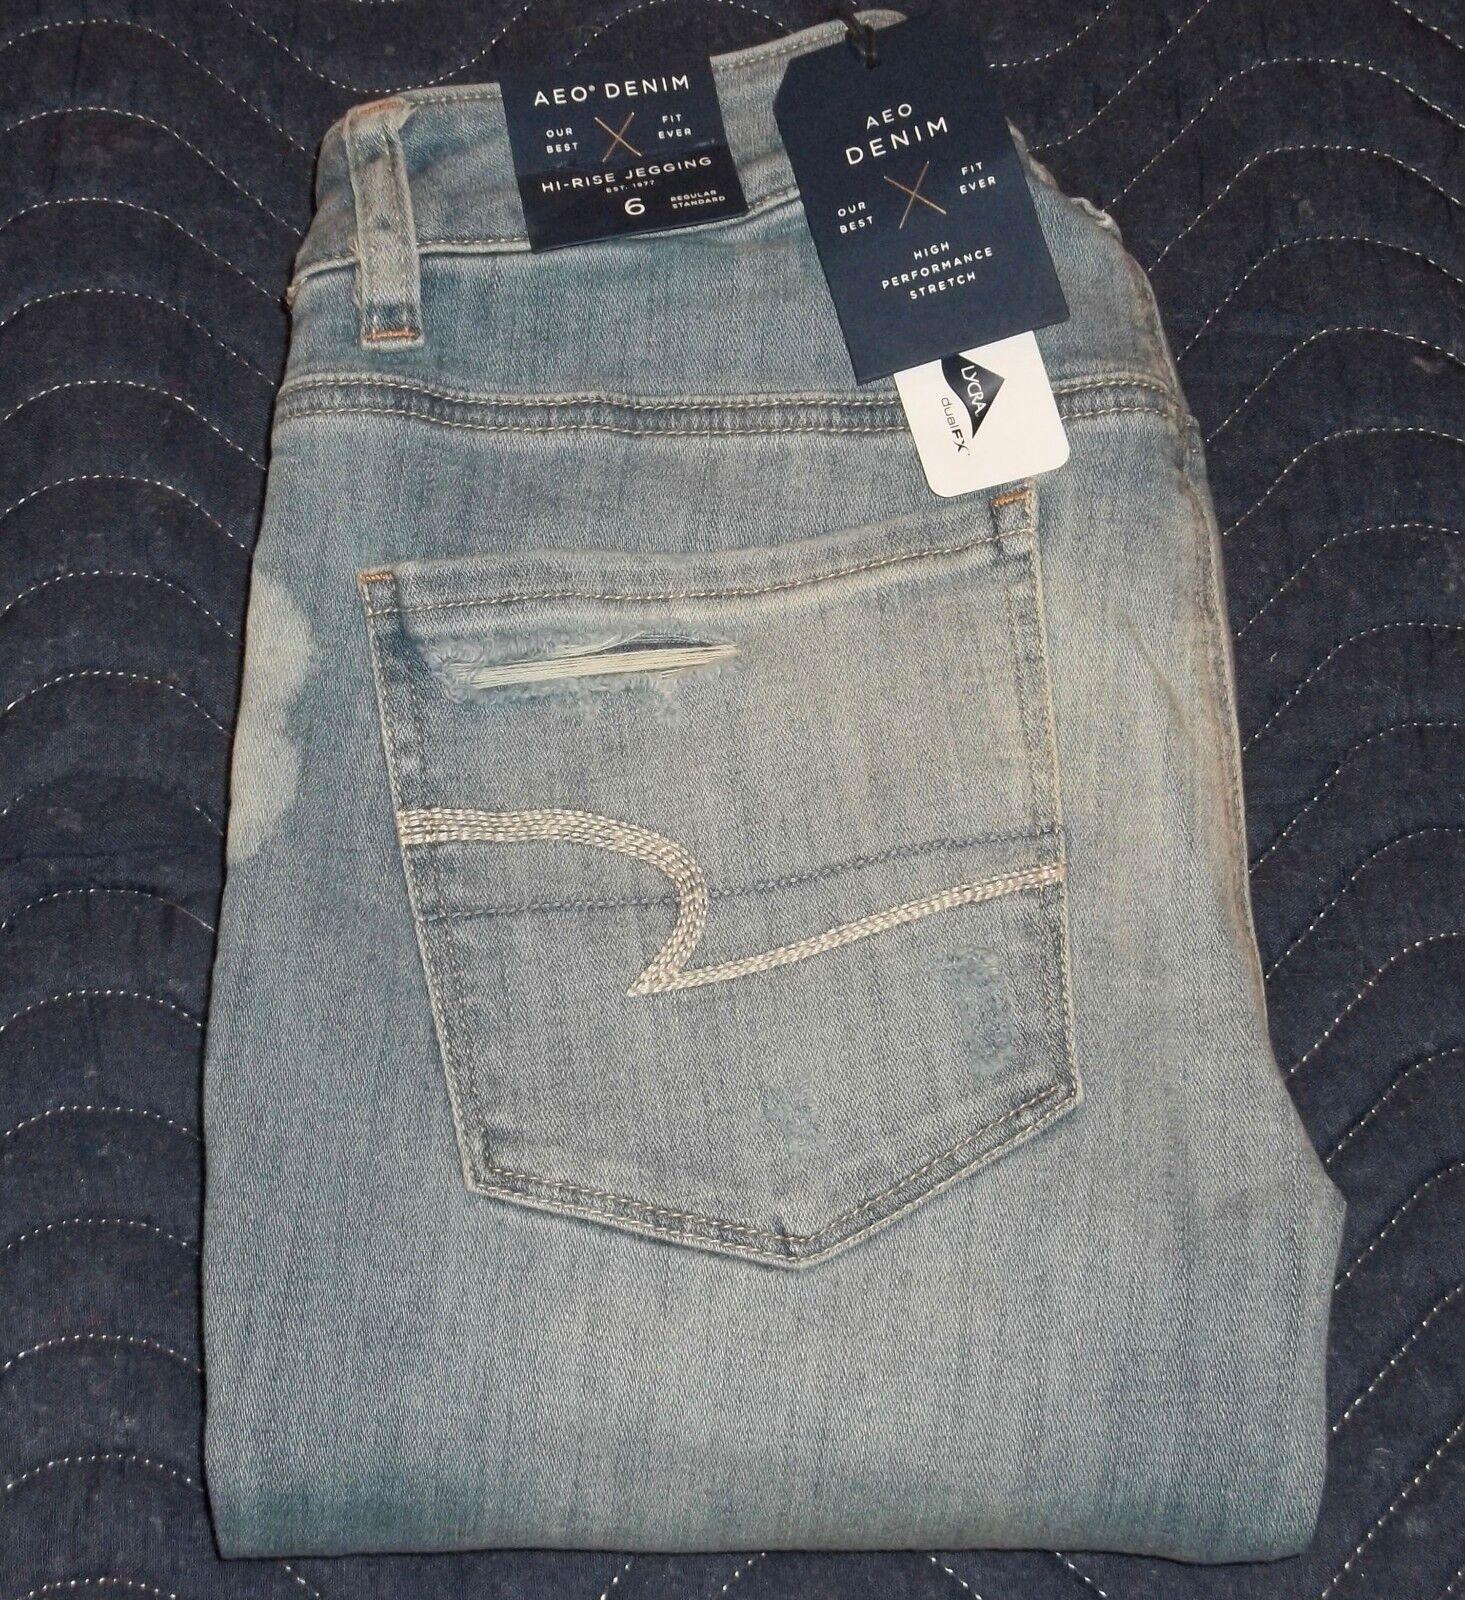 American Eagle AEO Denim Super Stretch Hi-Rise Jegging Jeans Size 6 Regular